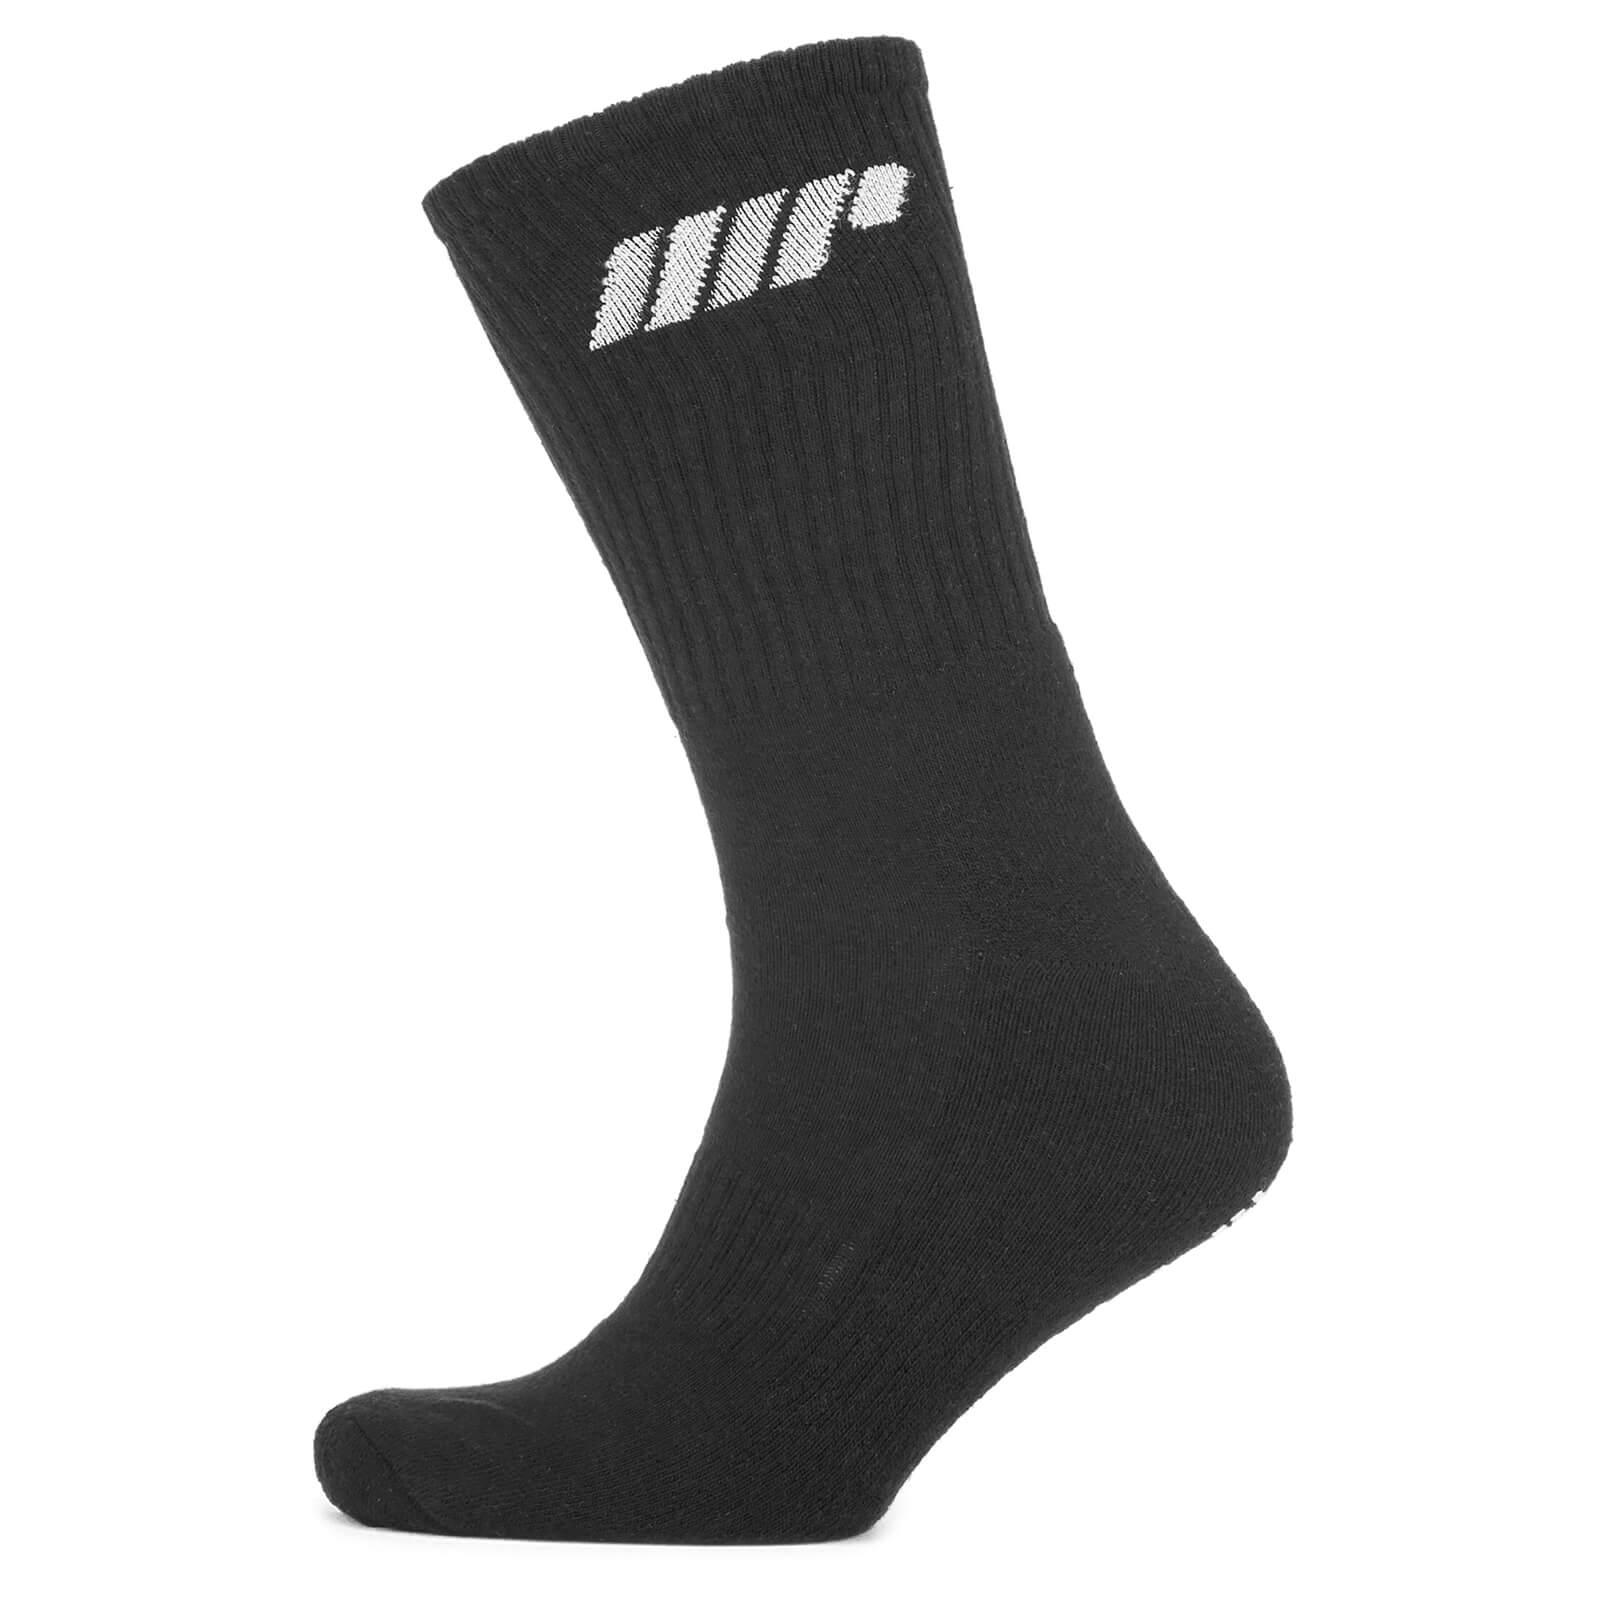 Myprotein 2 Pack Crew Socks - Slate Grey - UK 6-8 - Slate Grey